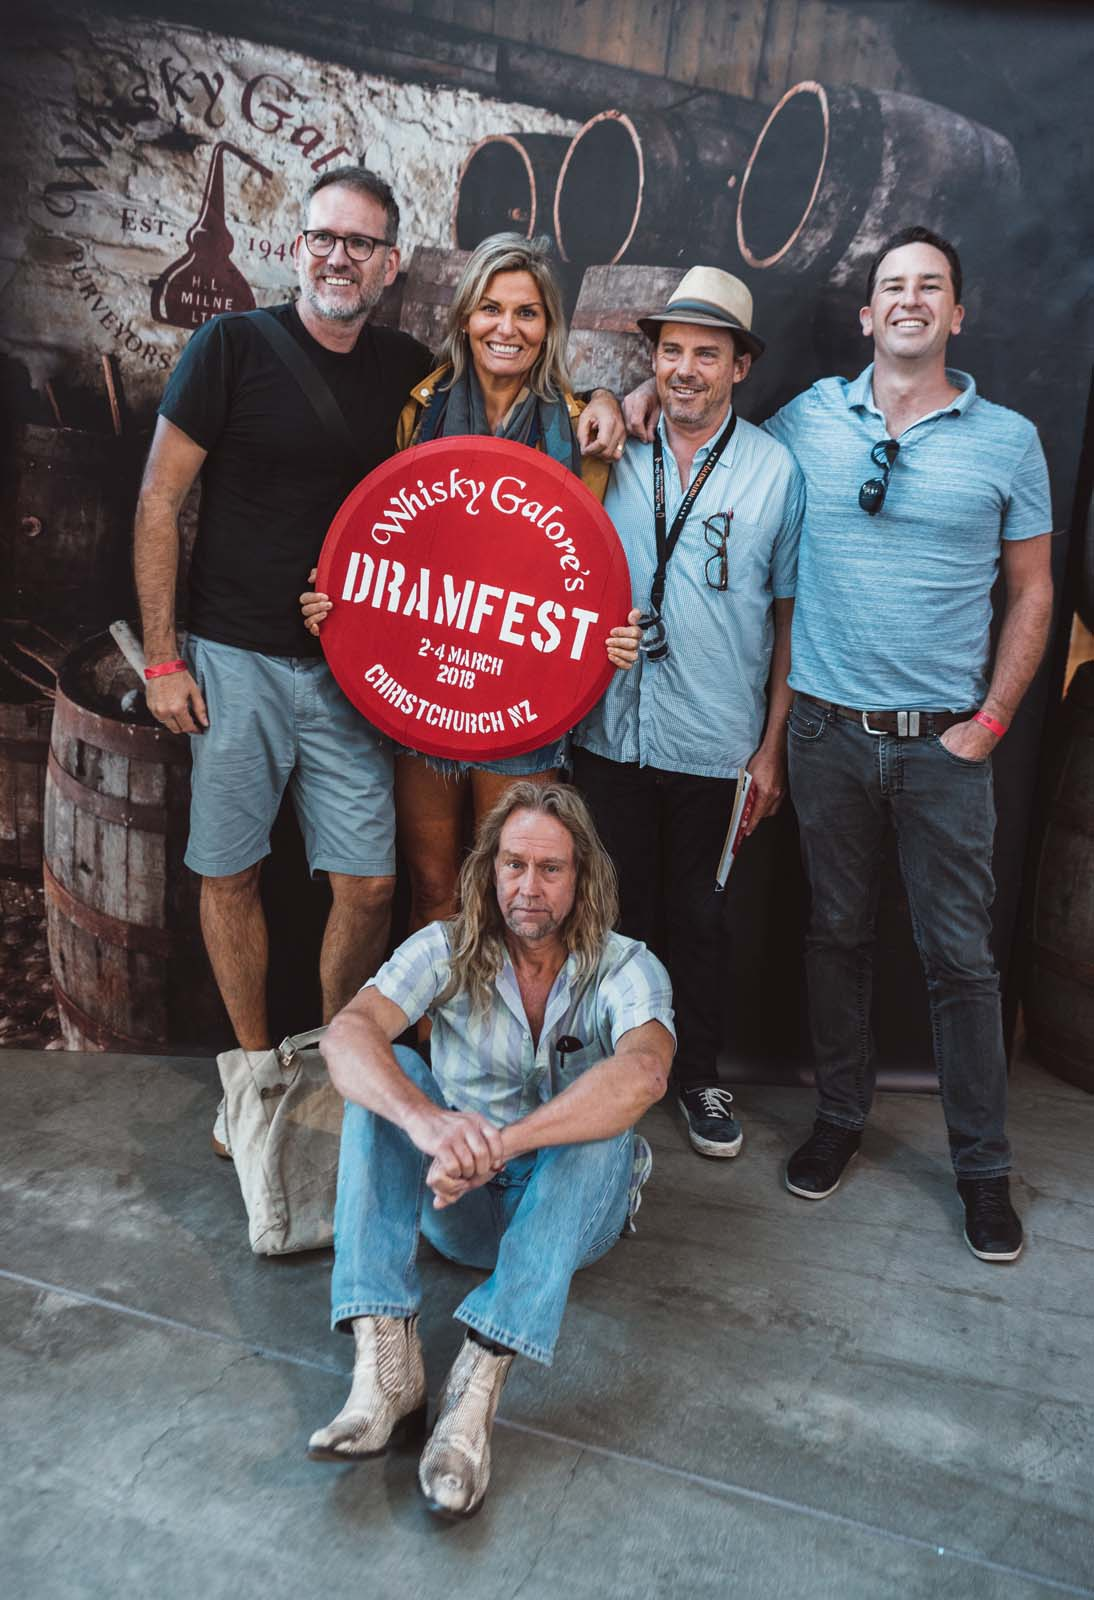 Dramfest 2018 for Whisky Galore-138.jpg